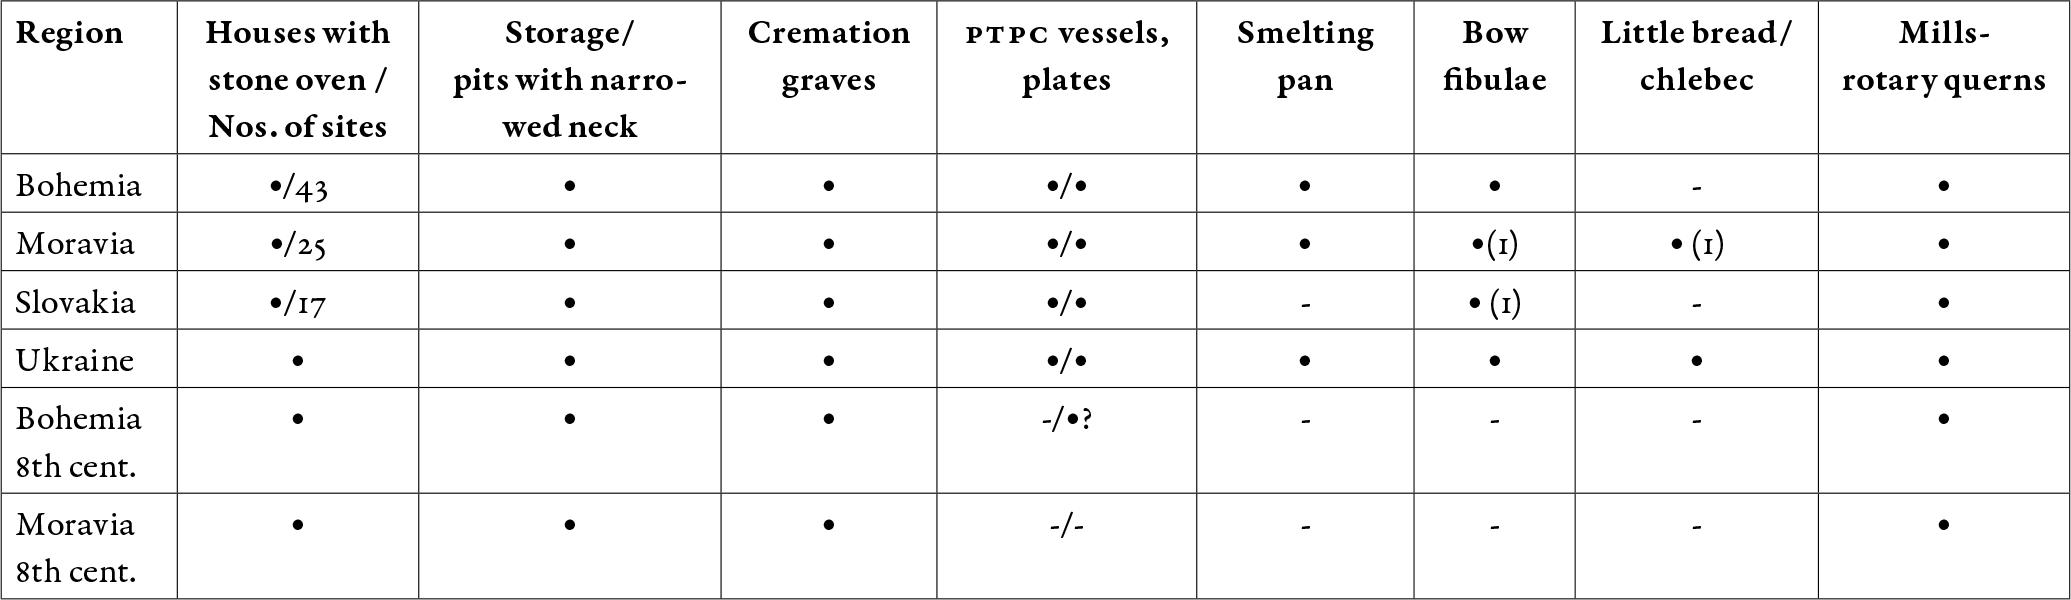 prague-type-pottery-culture-continuity-bohemia-moravia